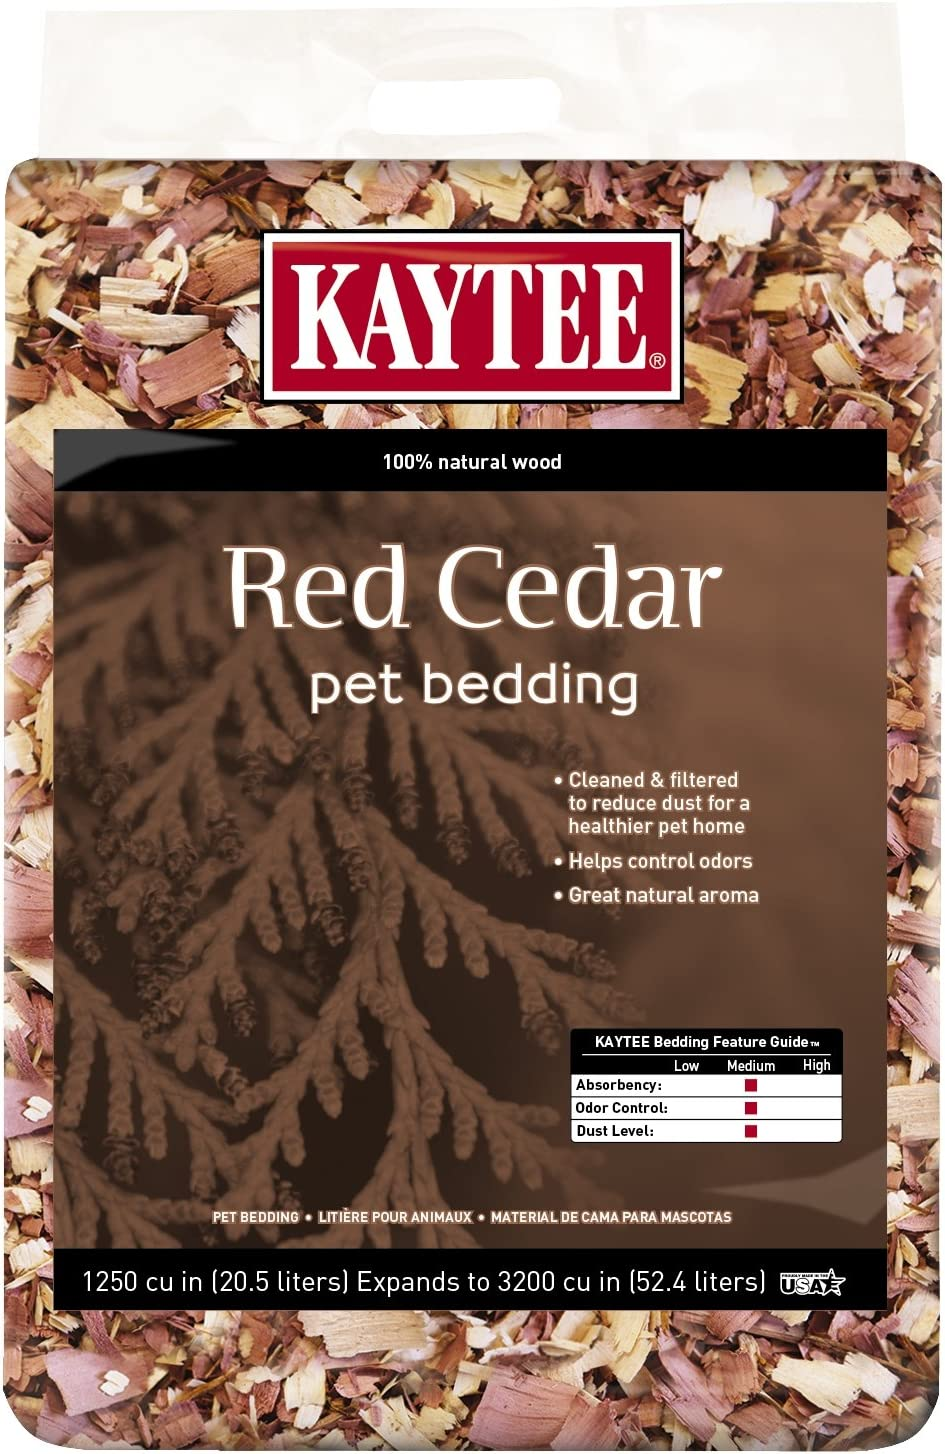 Kaytee Red Center Bedding